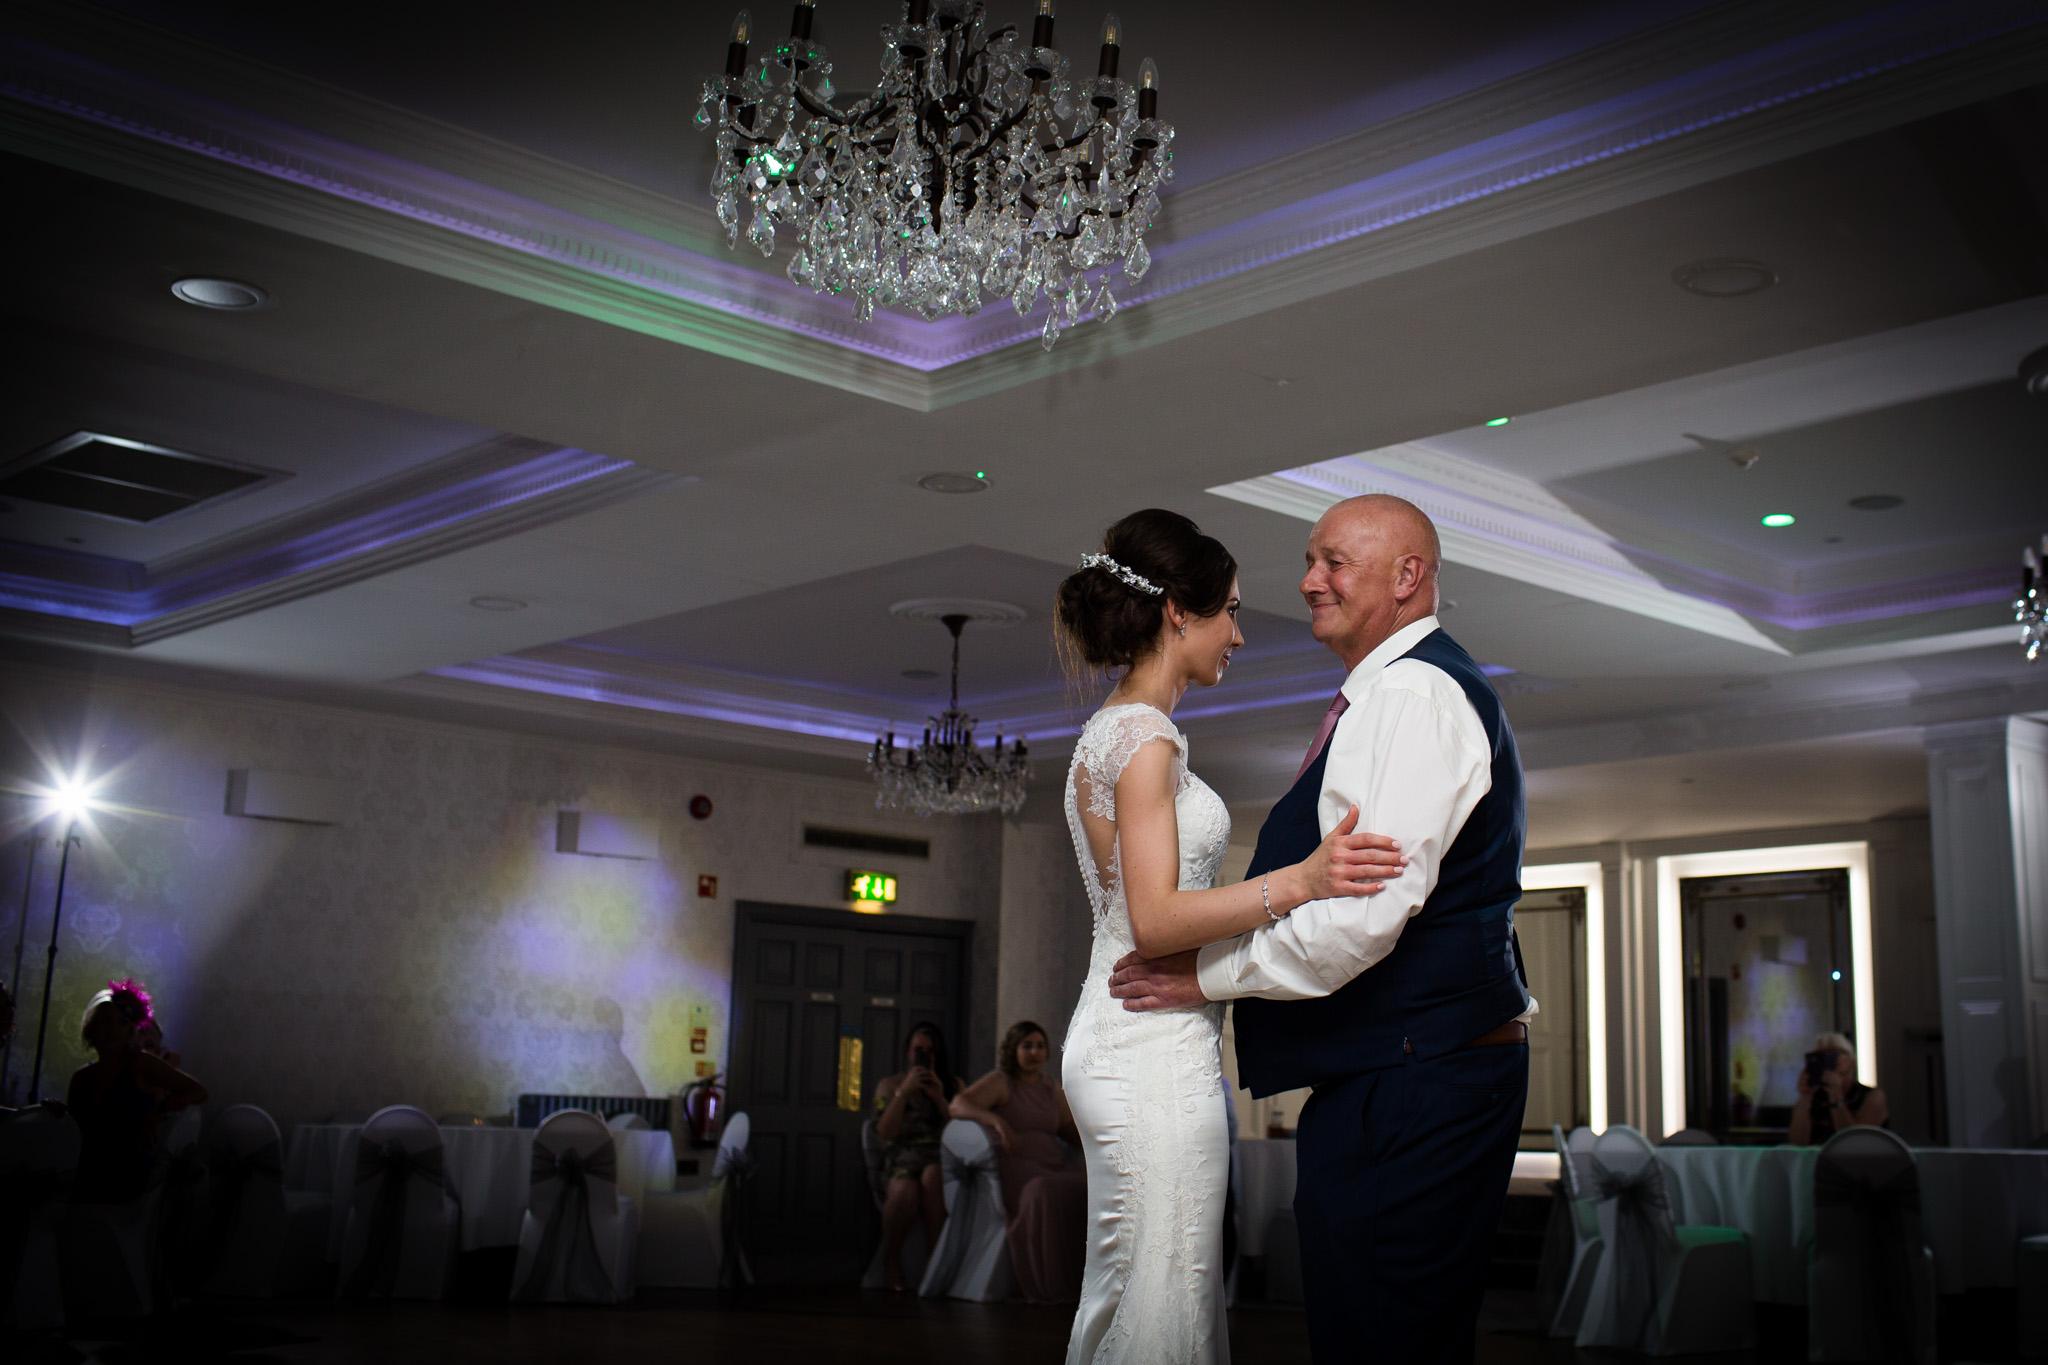 Mark_Barnes_Northern_Ireland_Wedding_Photography_Leighinmohr-house-hotel-ballymena_Wedding_Photography-68.jpg